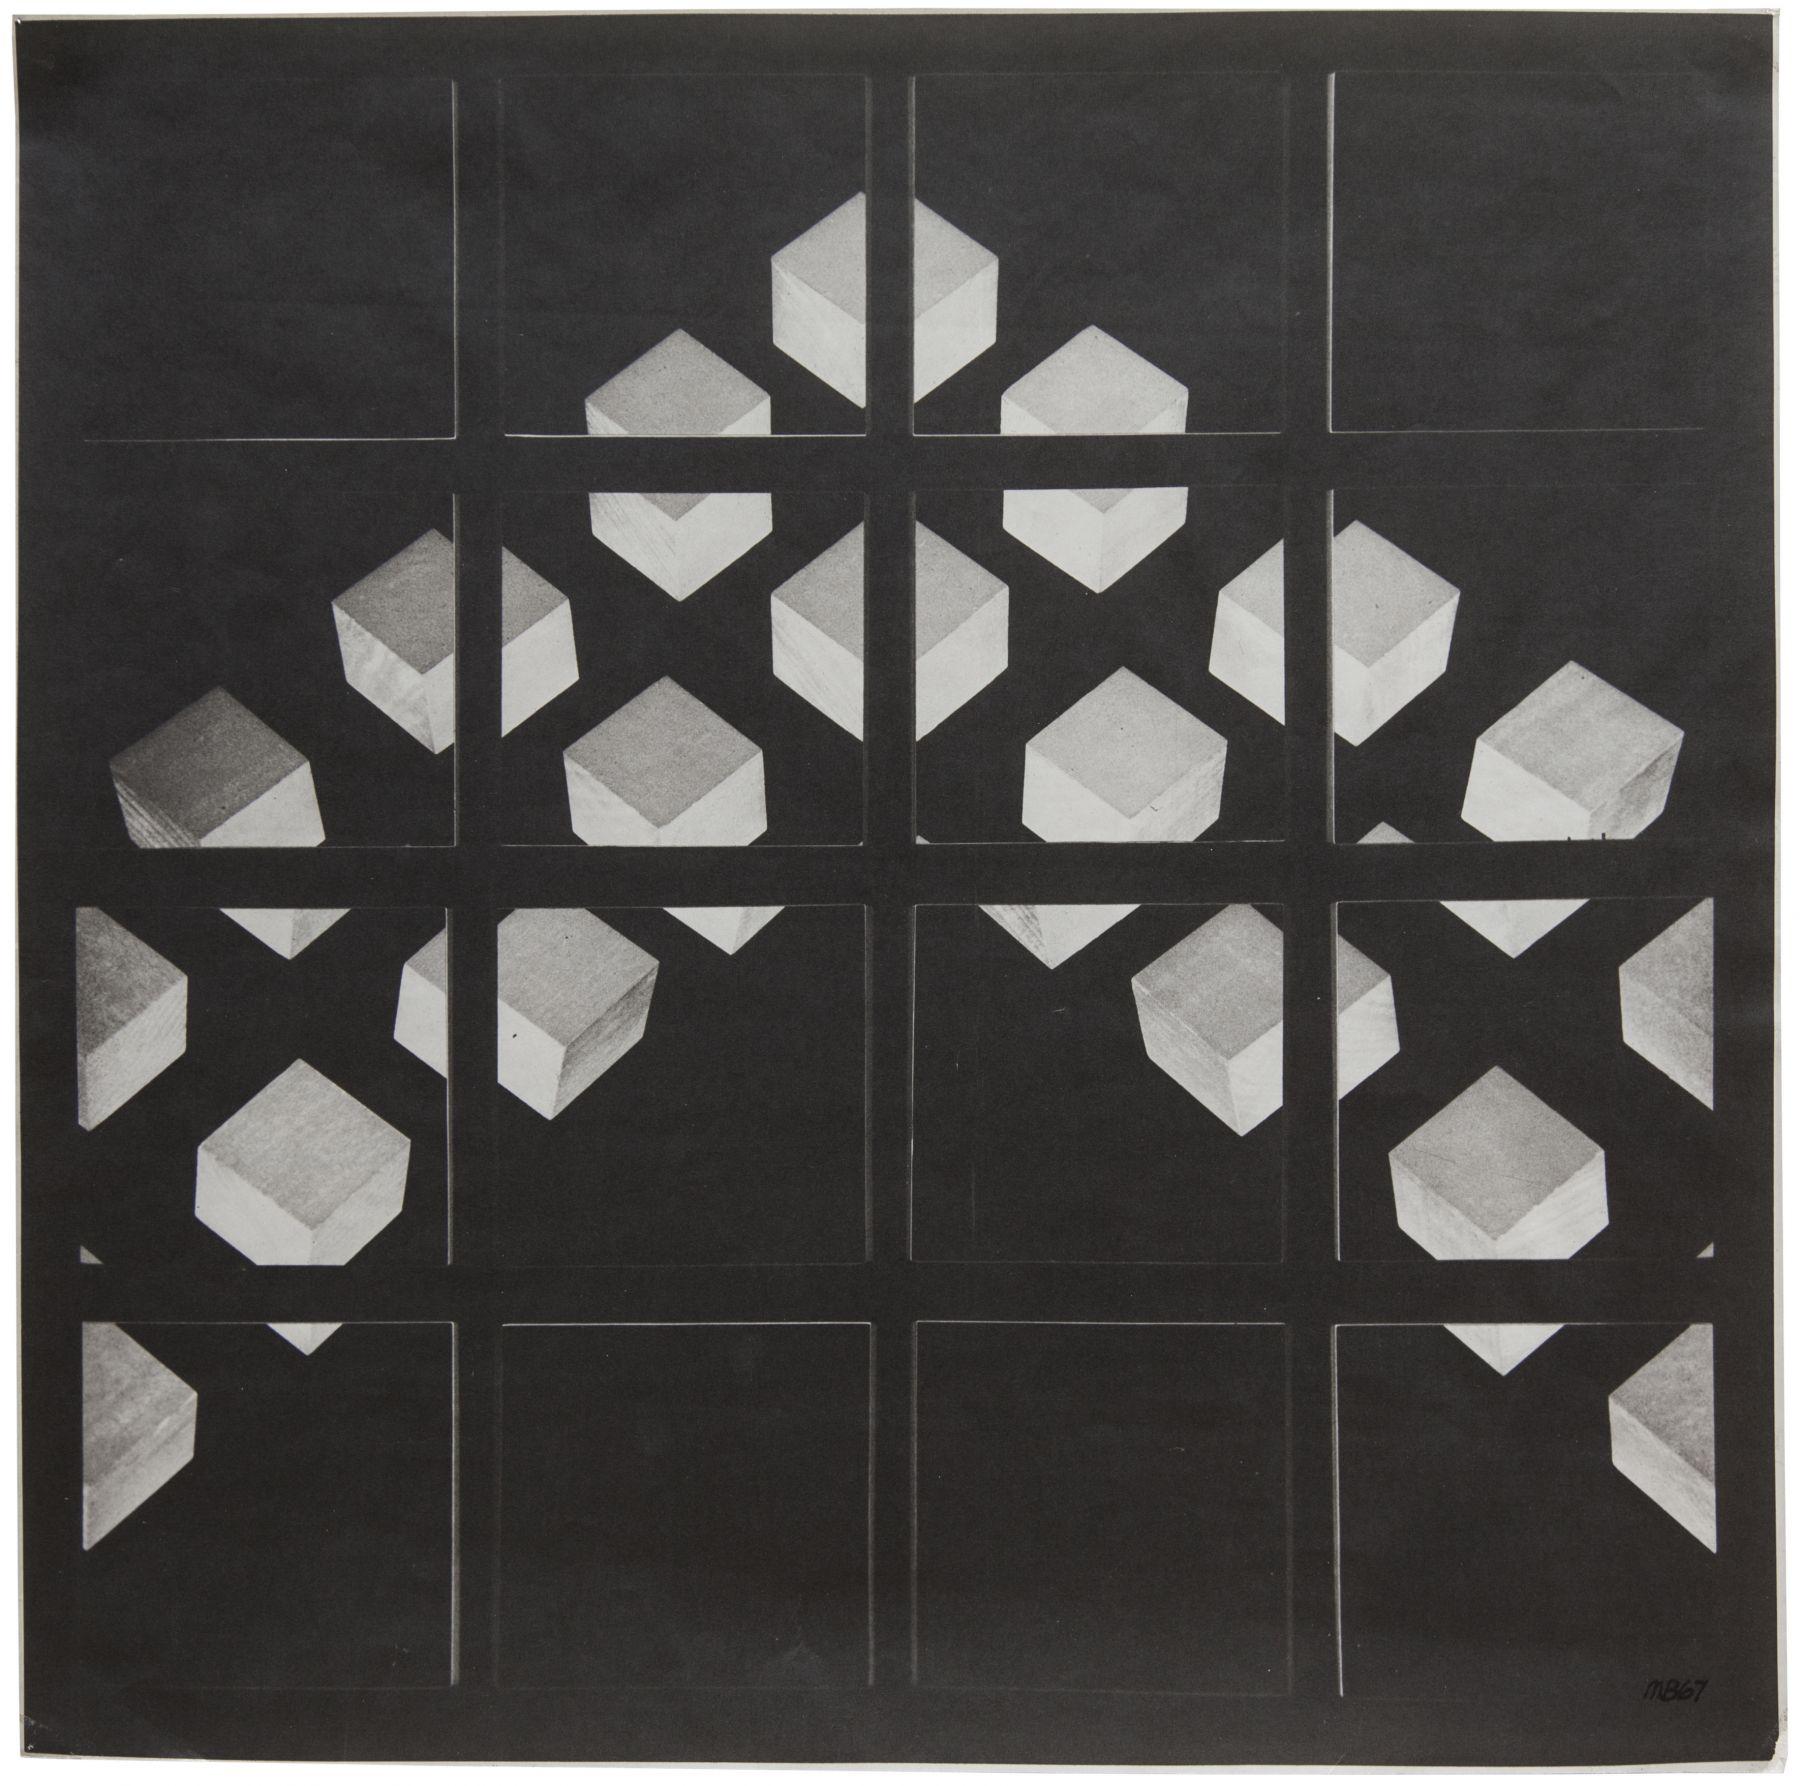 Mel Bochner,Isomorph A4, 1967. Photograph, 16 1/4 x 16 1/4 inches.